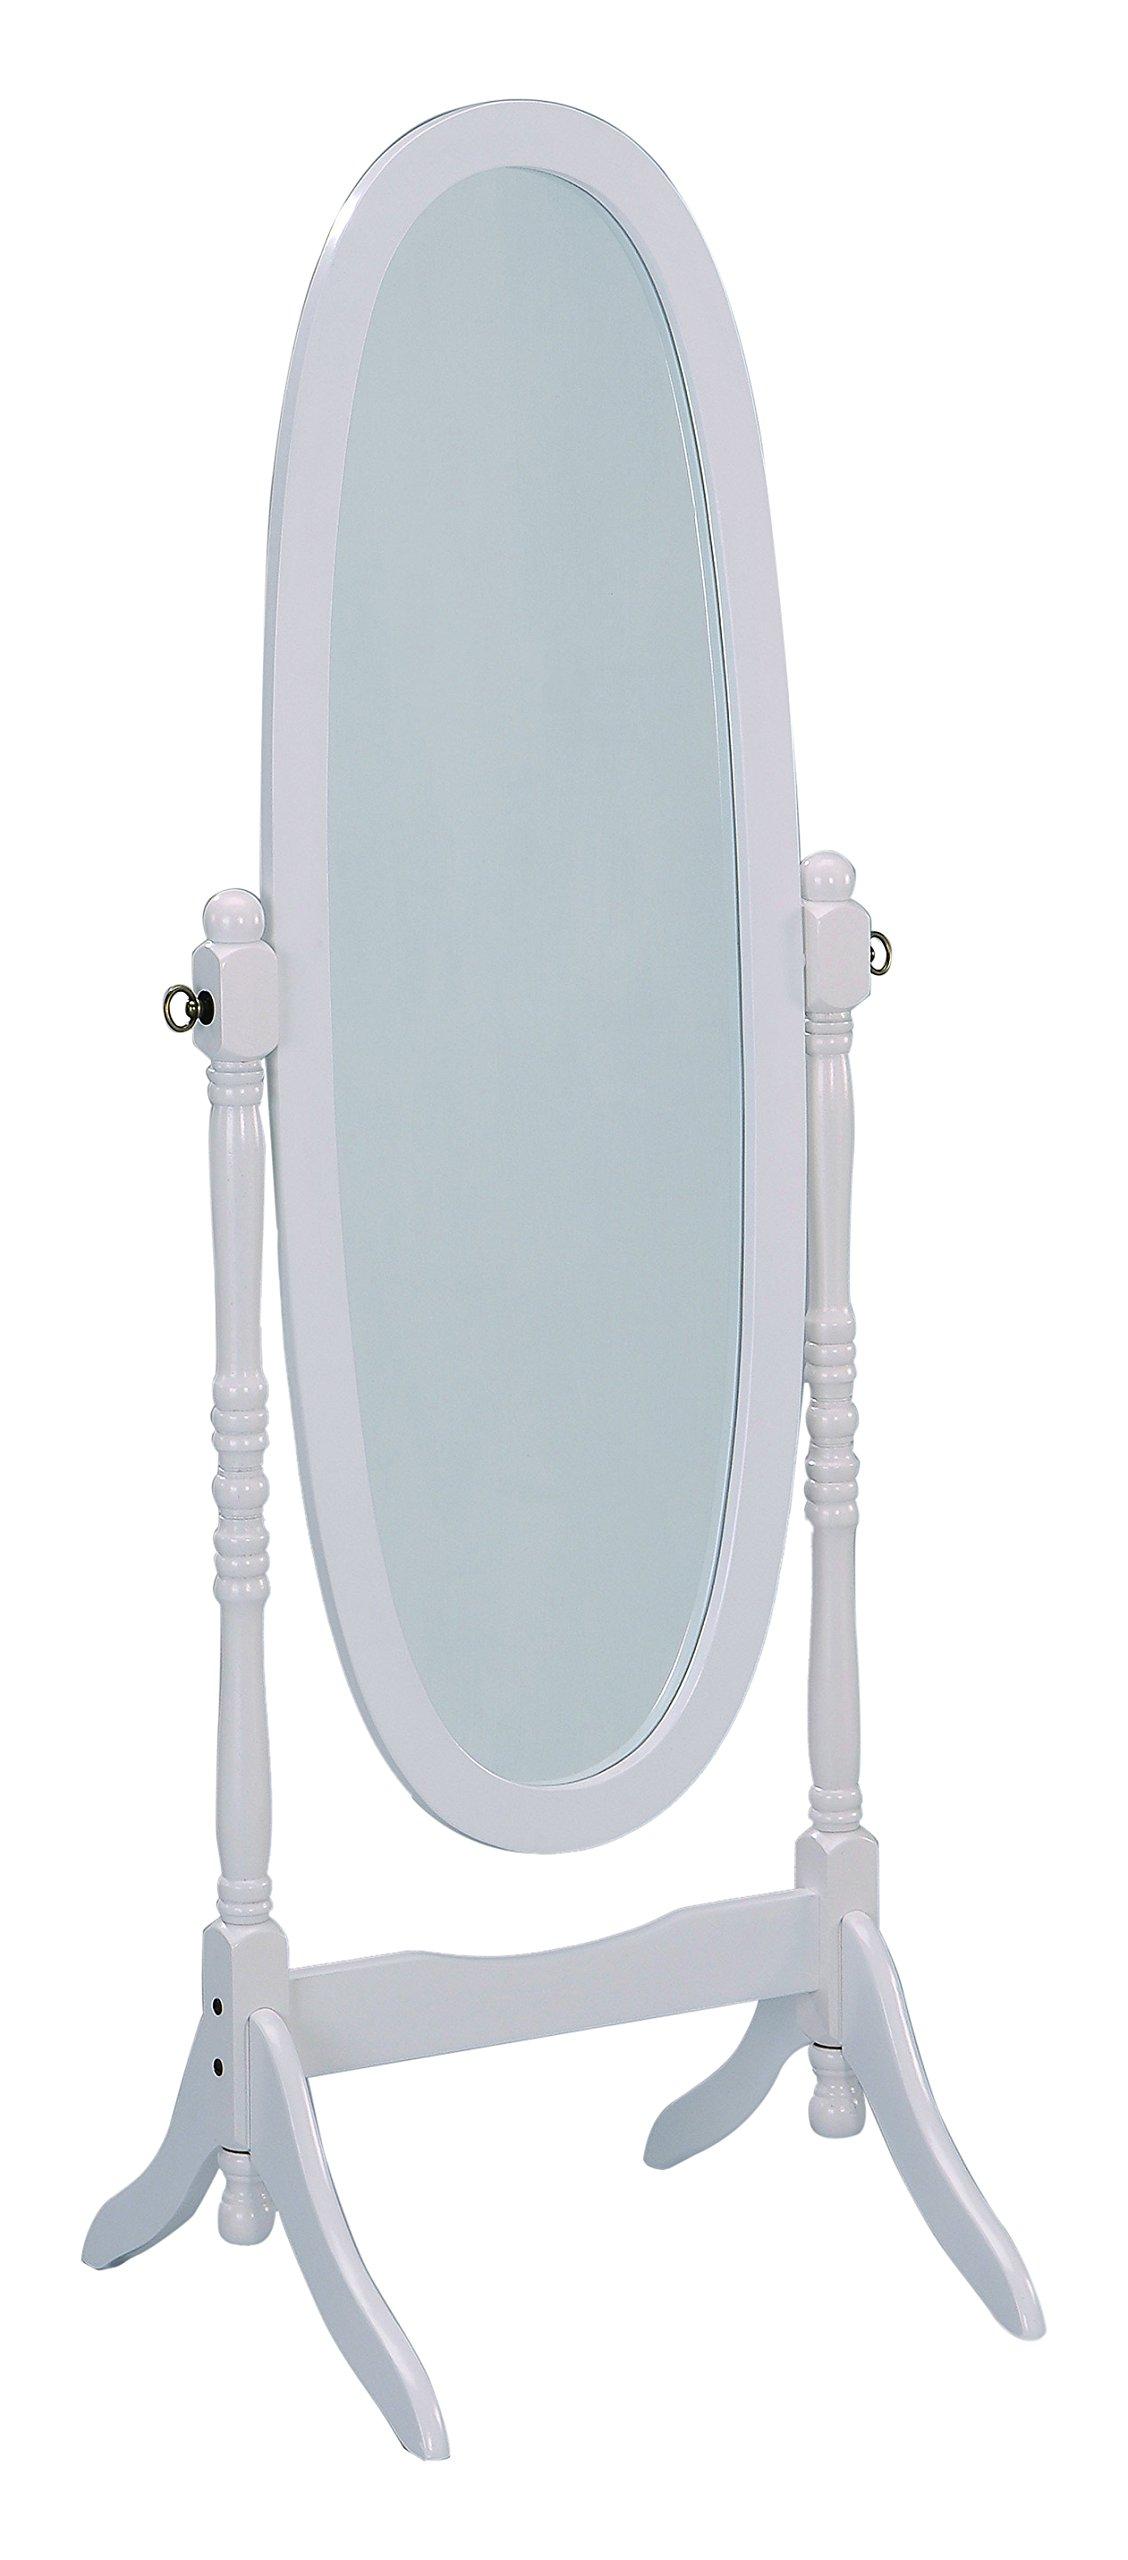 Crown Mark Cheval Mirror, White Finish